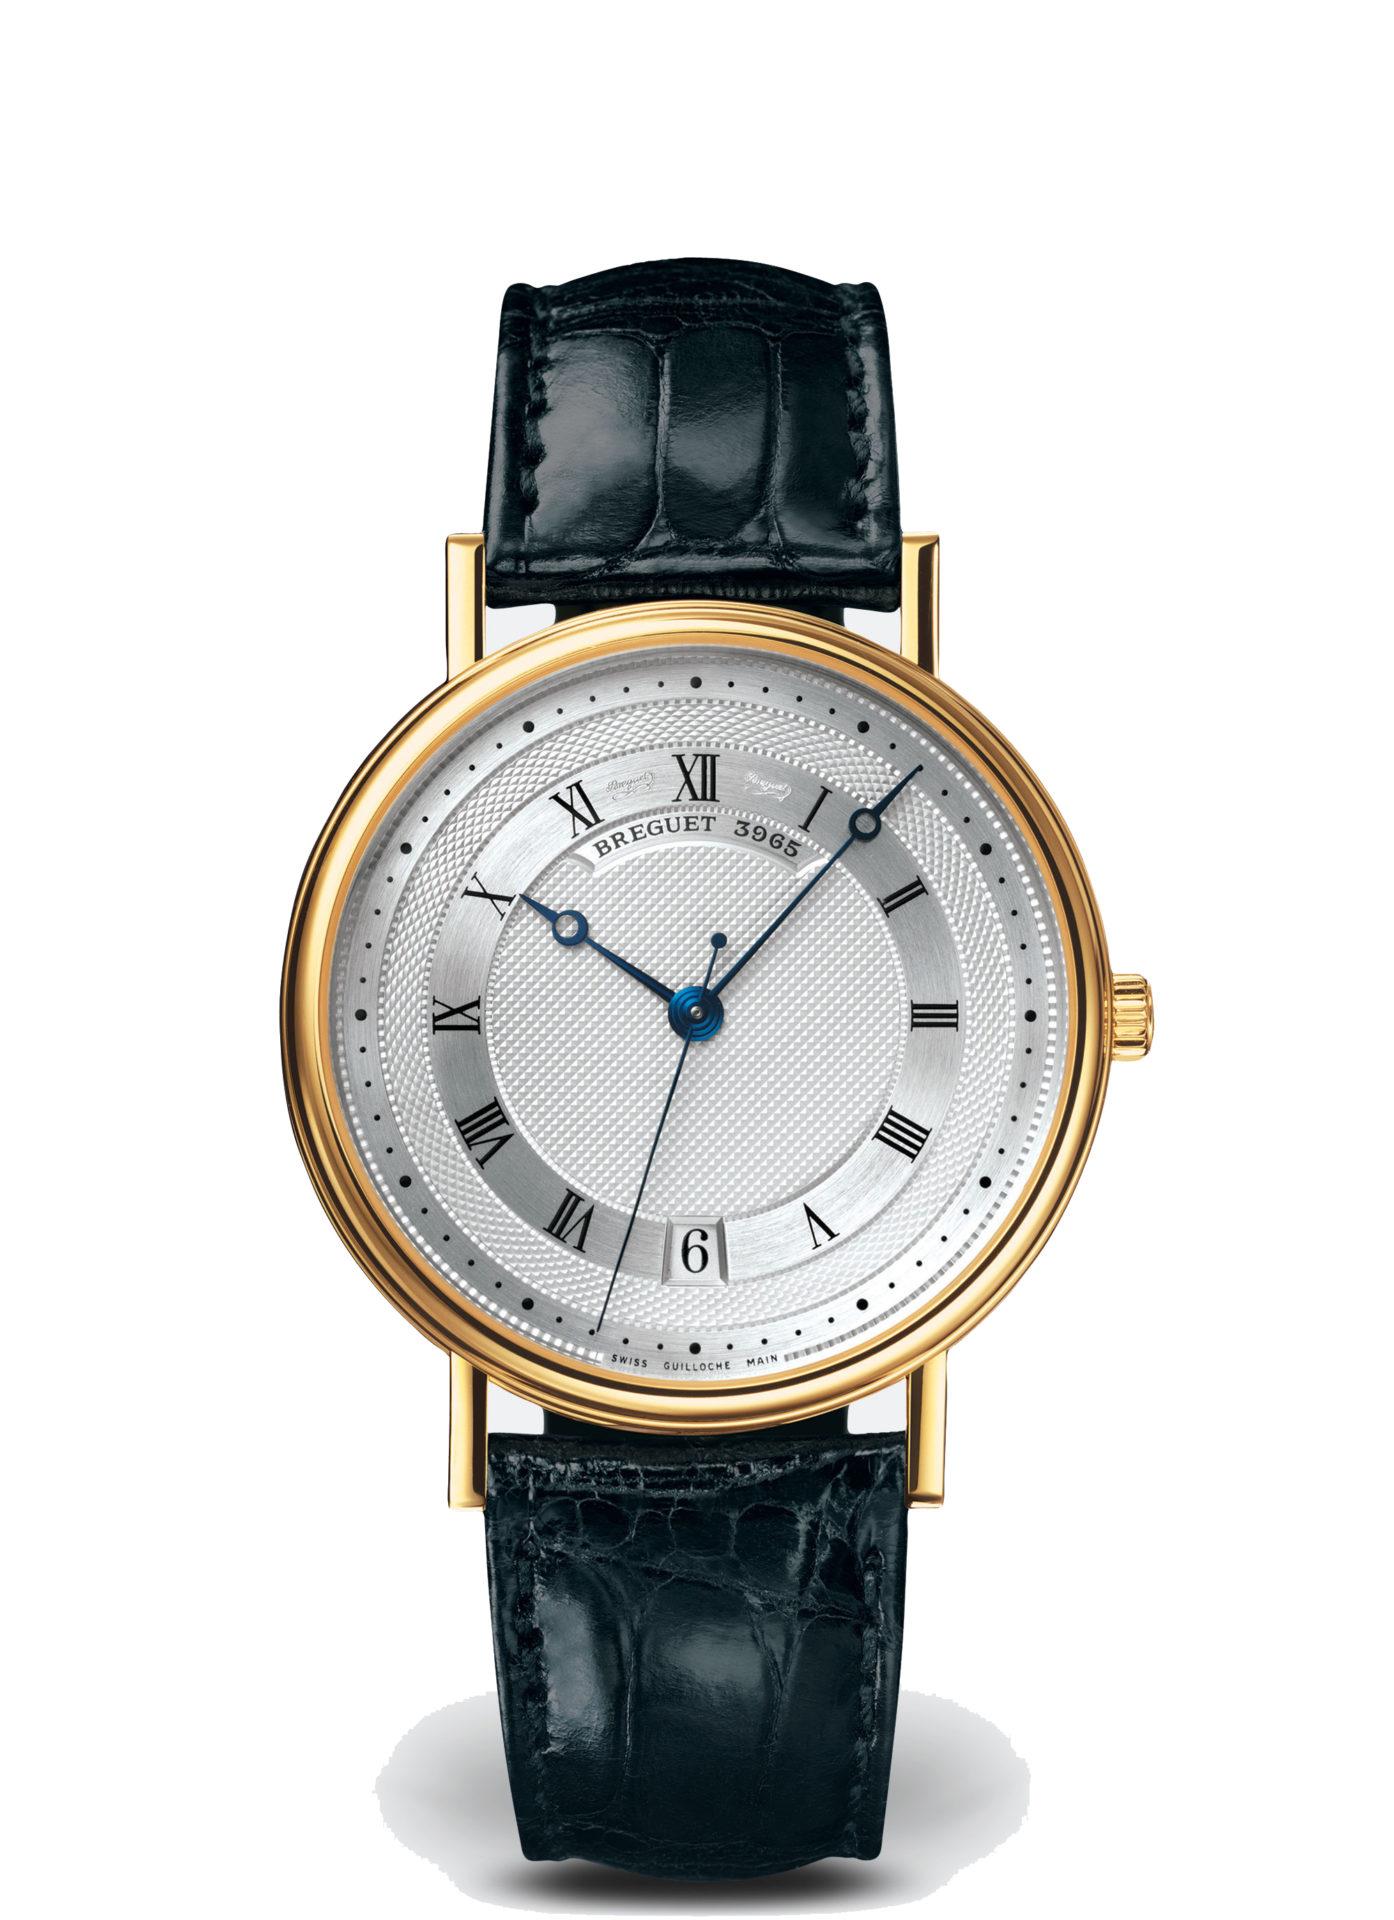 Breguet-Classique-5930-Hall-of-Time-5930ba-12-986-0 copie